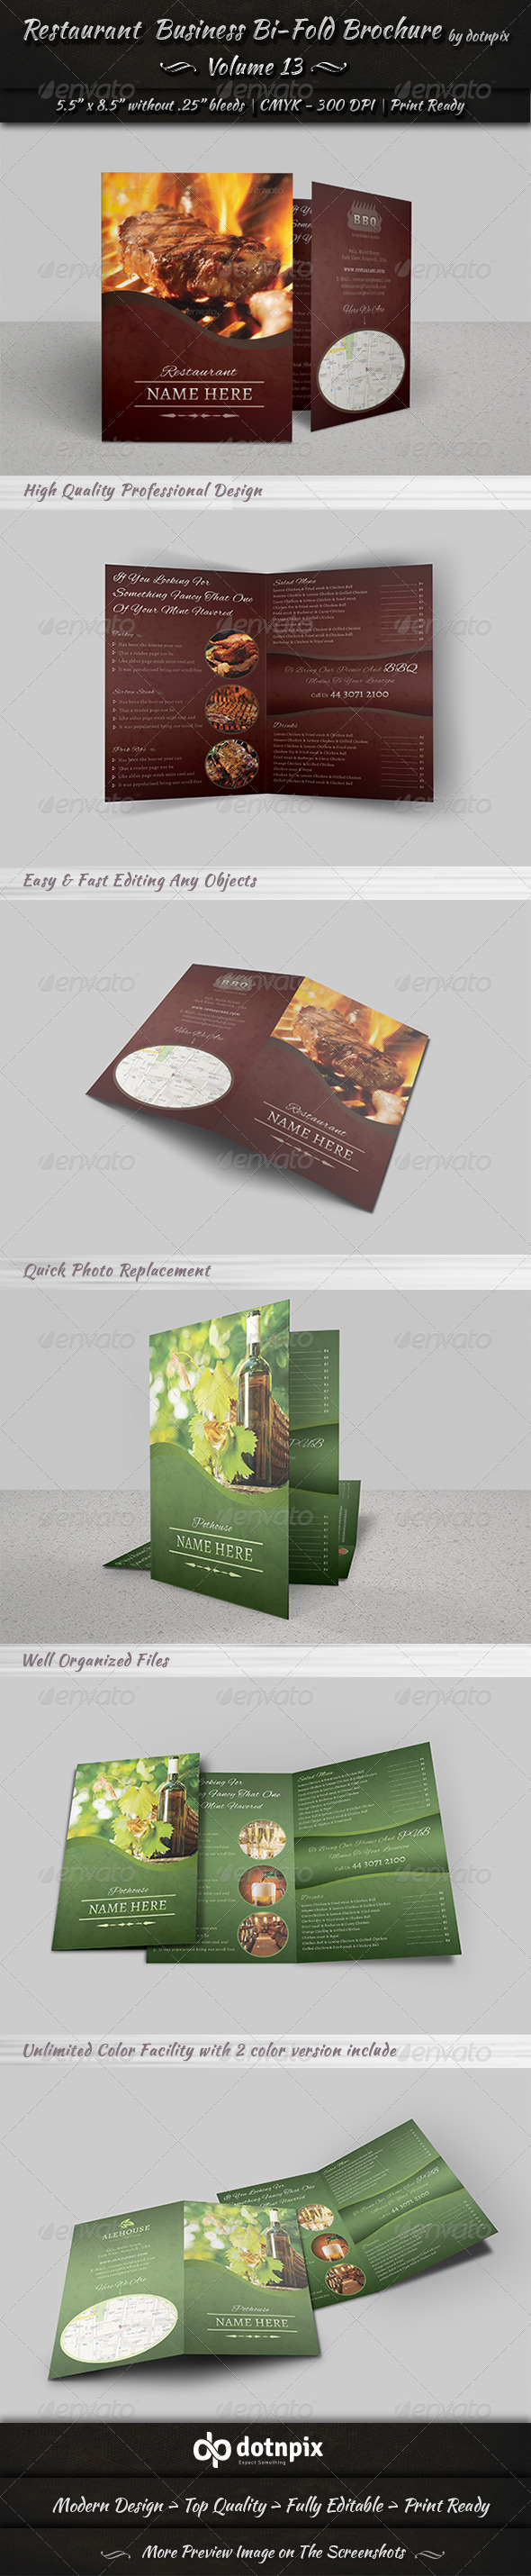 GraphicRiver Restaurant Business Bi-Fold Brochure Volume 13 6623007